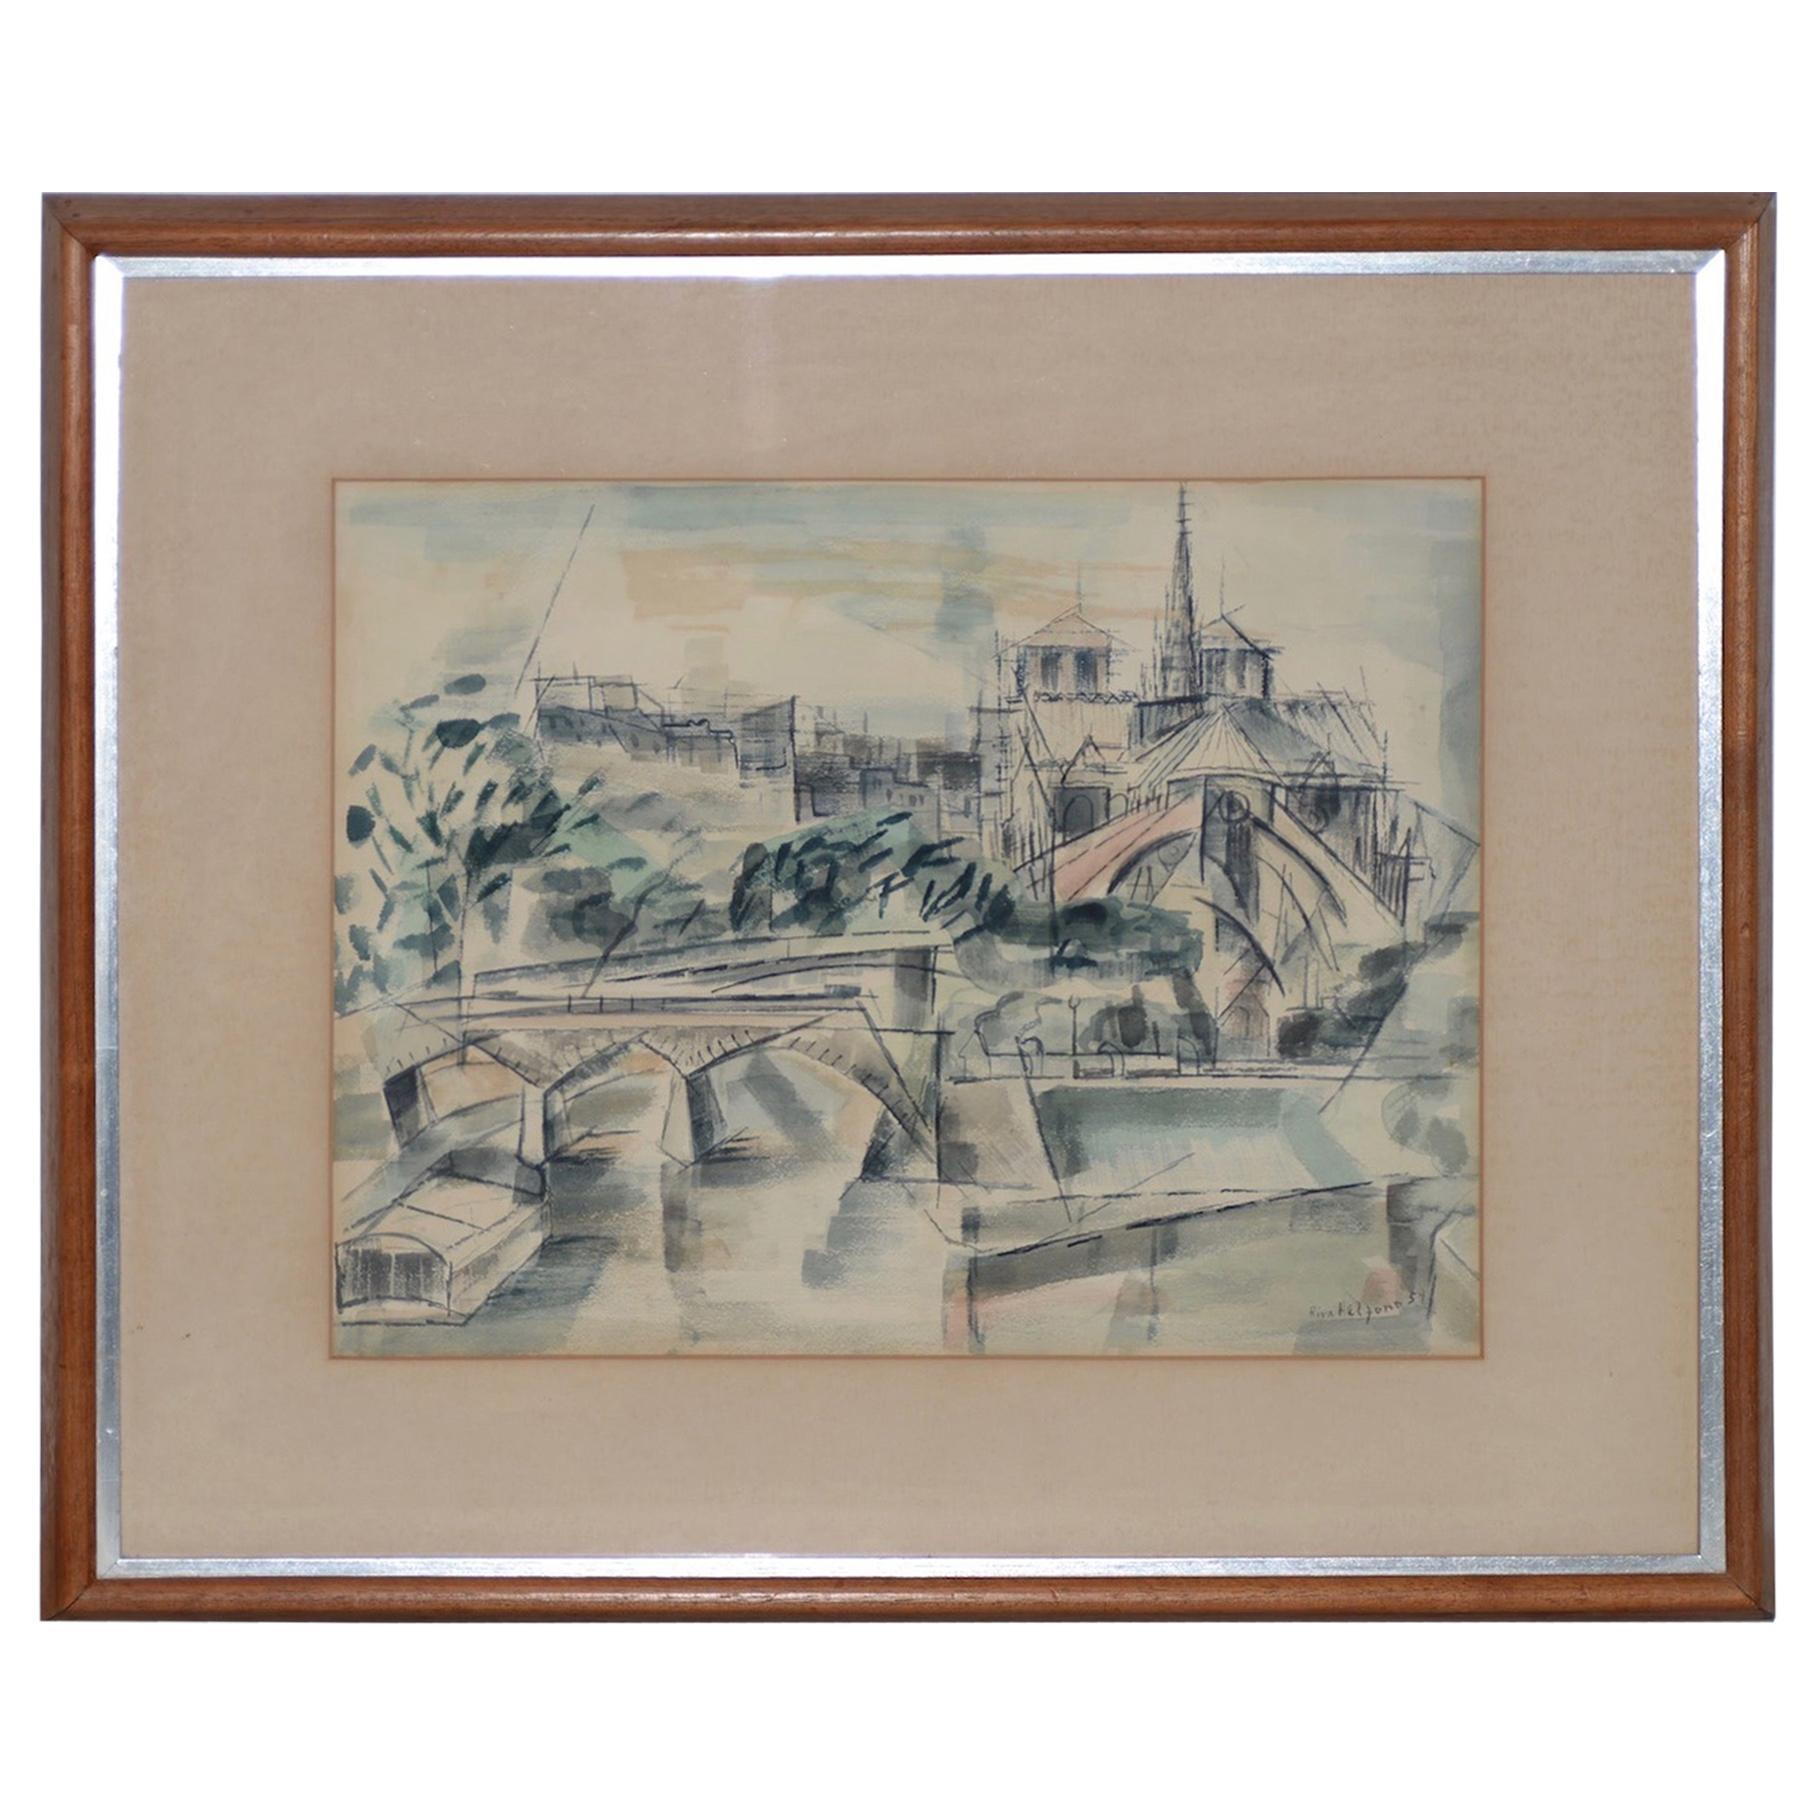 Riva Helfond Notre-Dame de Paris Cathedral in Abstract Watercolor, circa 1954